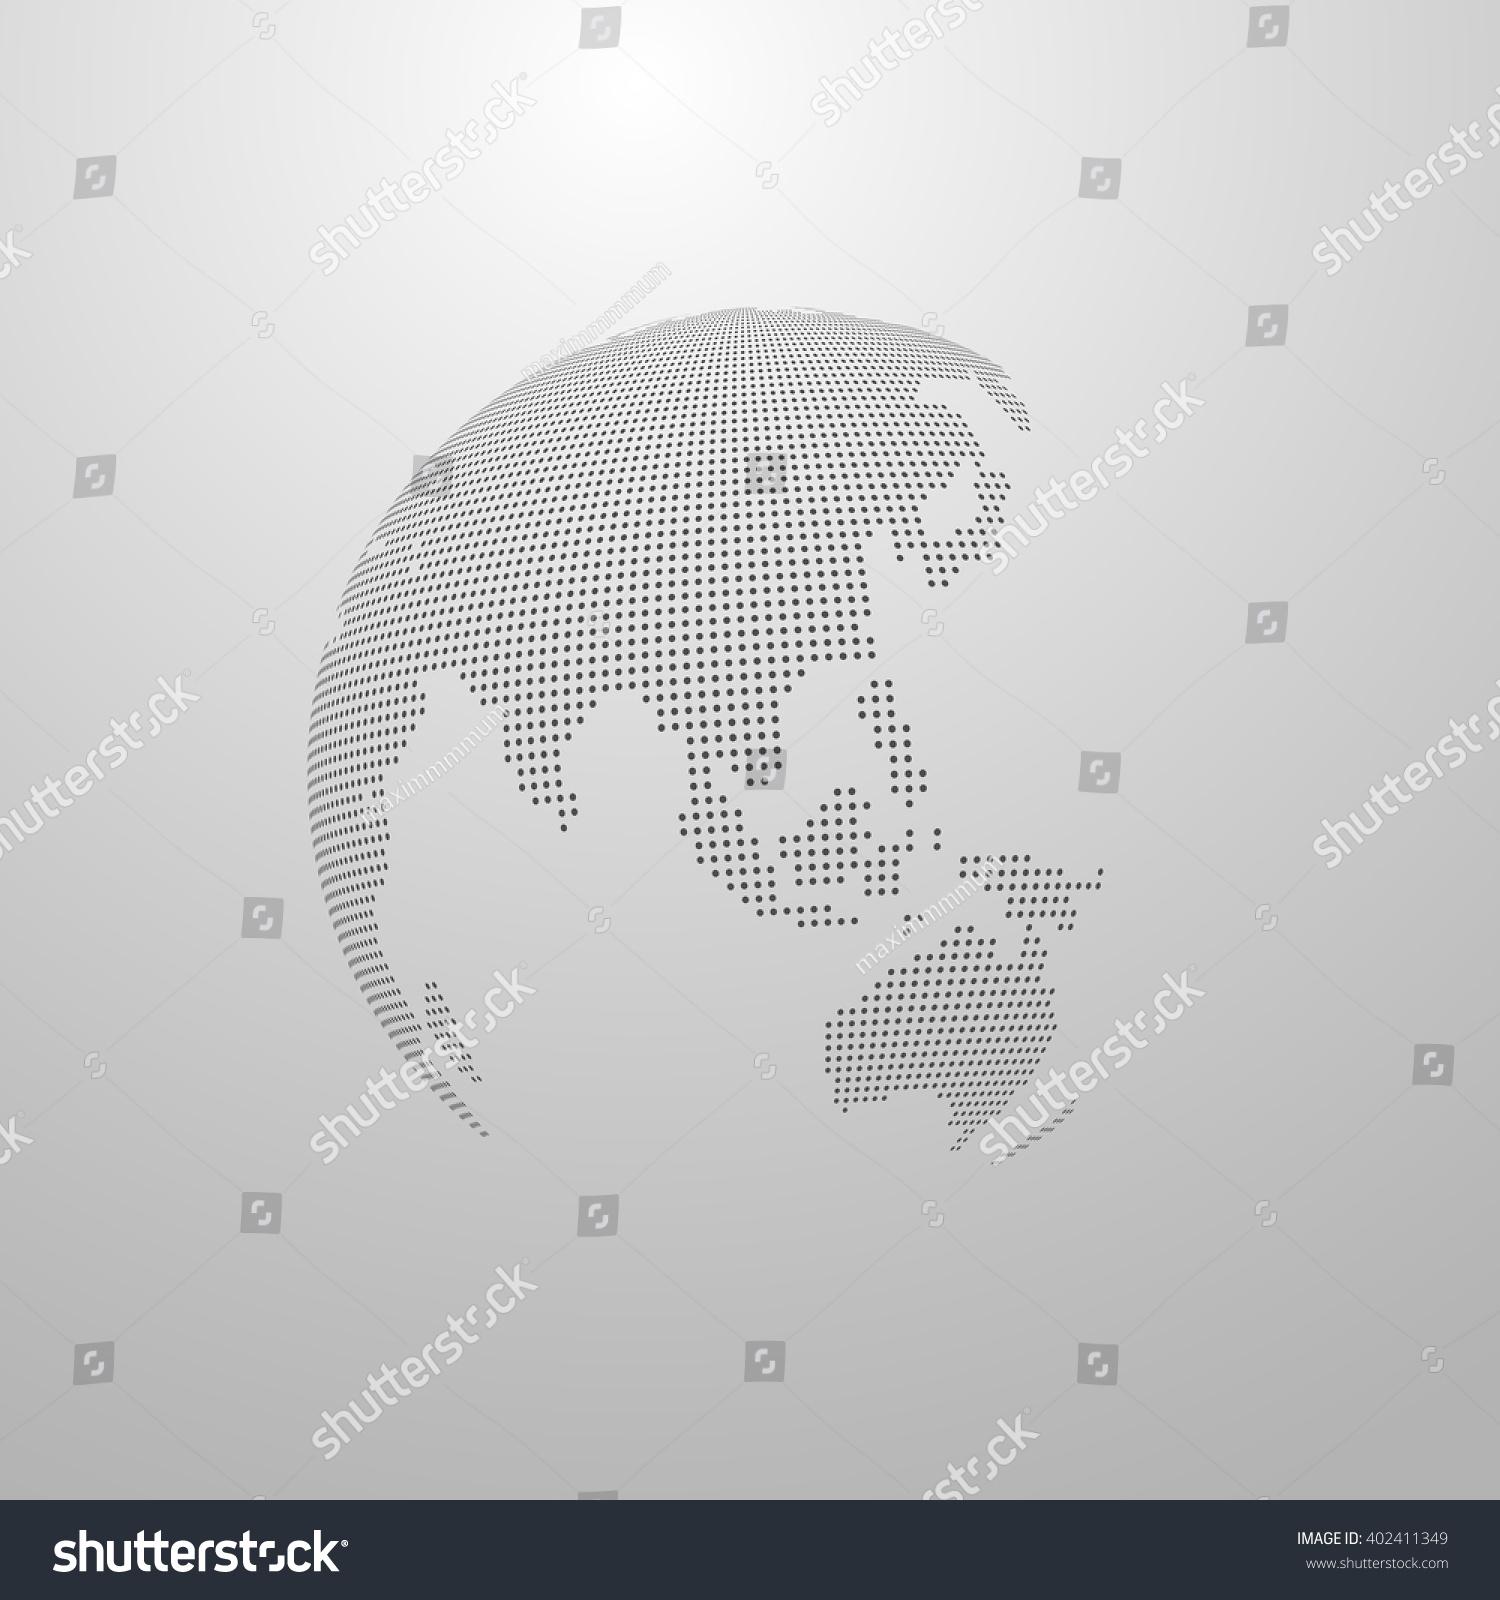 Vector illustration halftone world map globe stock vector 402411349 vector illustration of a halftone world map globe label design world global communication concept gumiabroncs Images